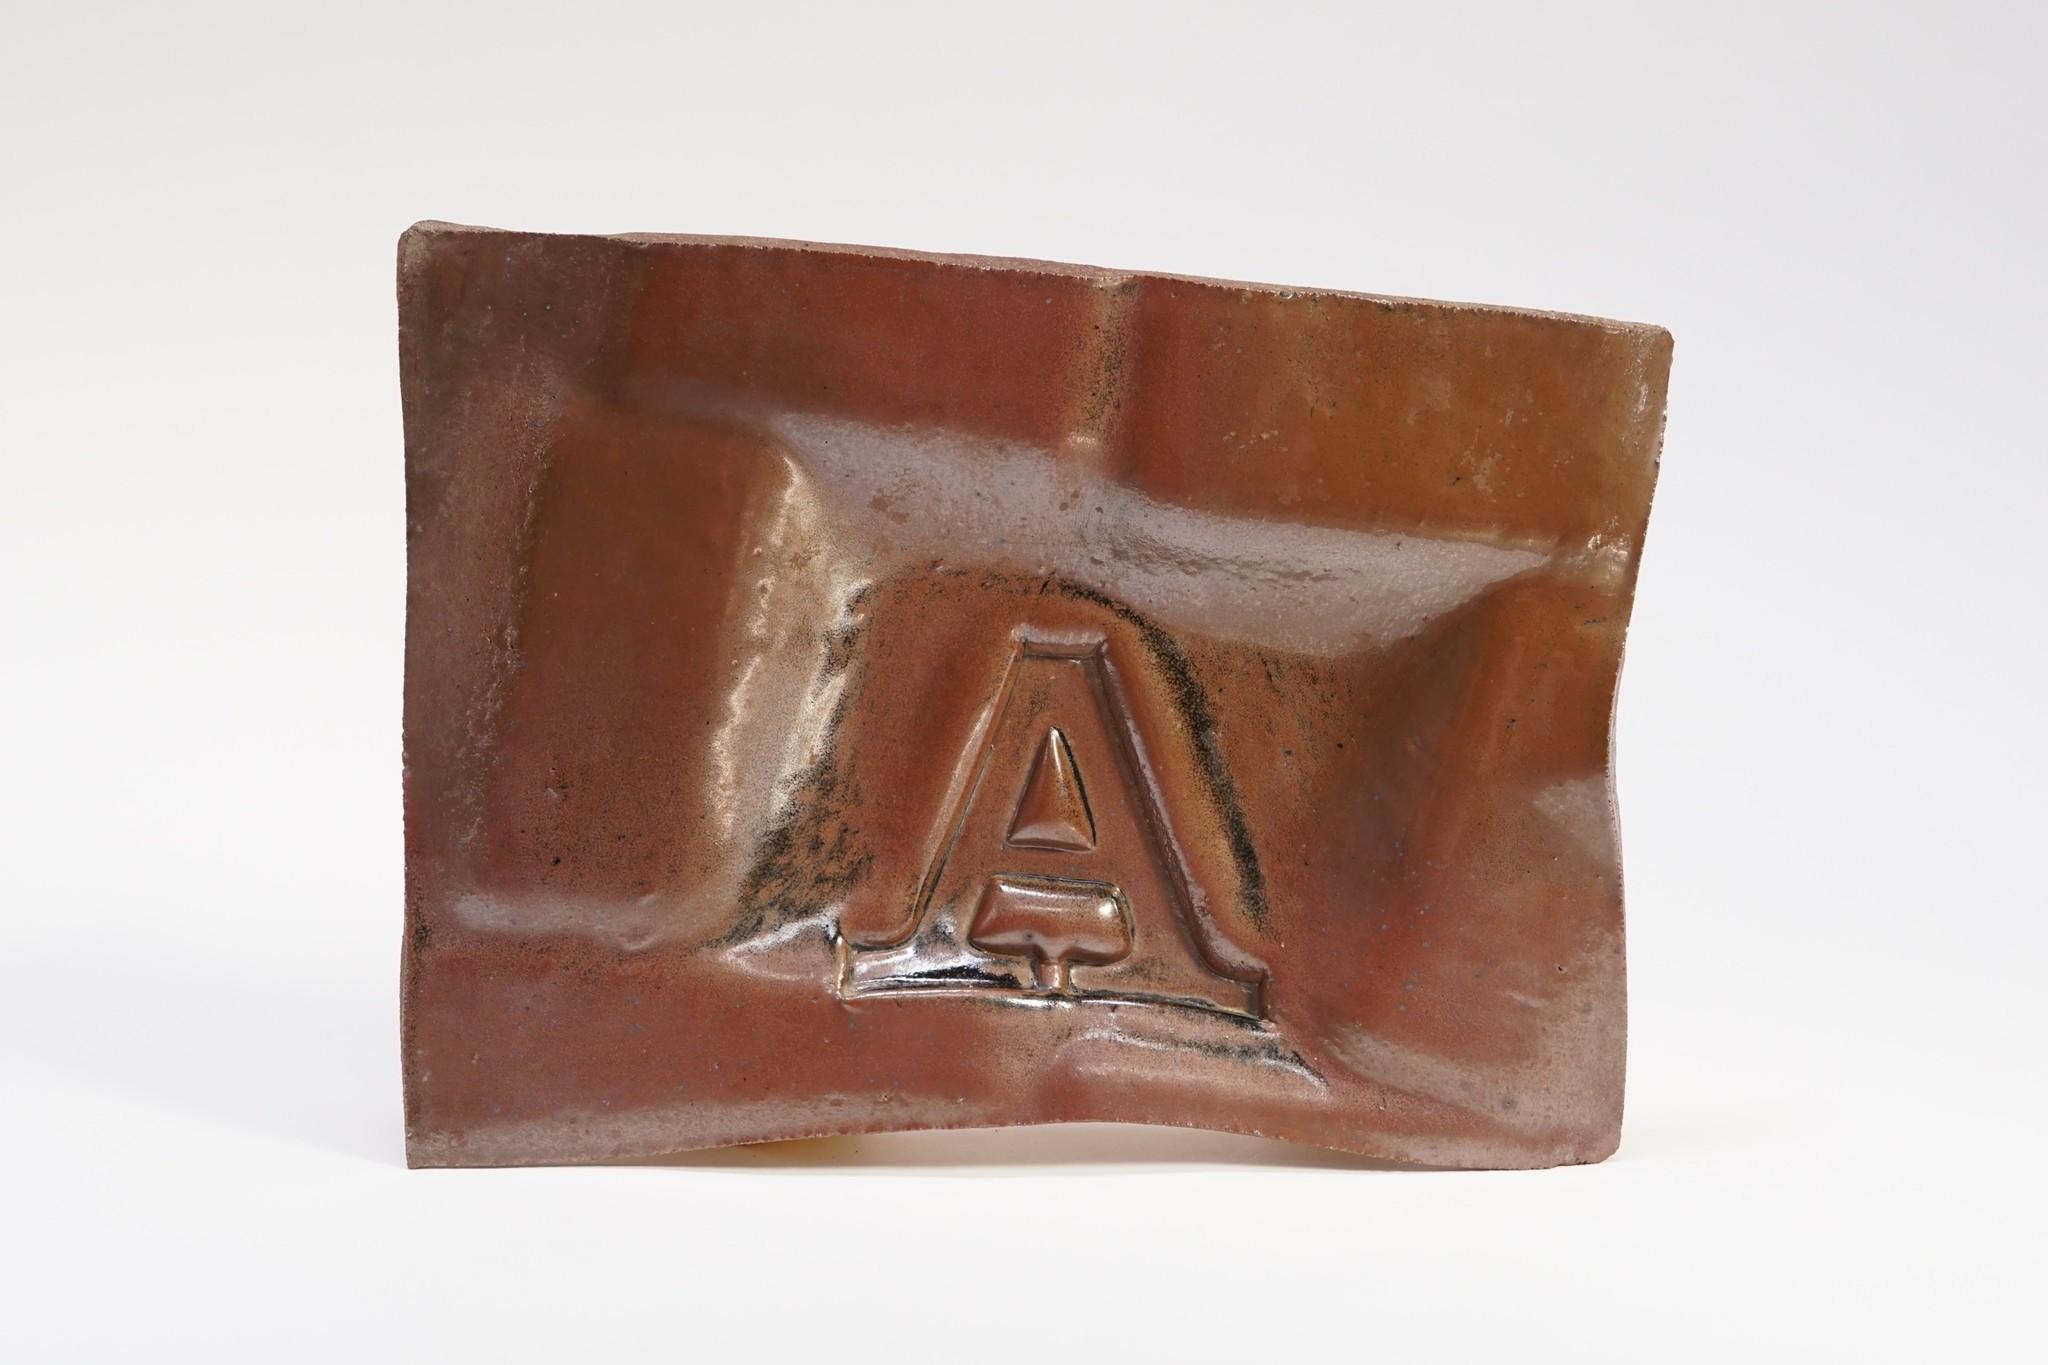 """Brown A Plate,"" 1969, by John Mason at Kayne Griffin Corcoran."